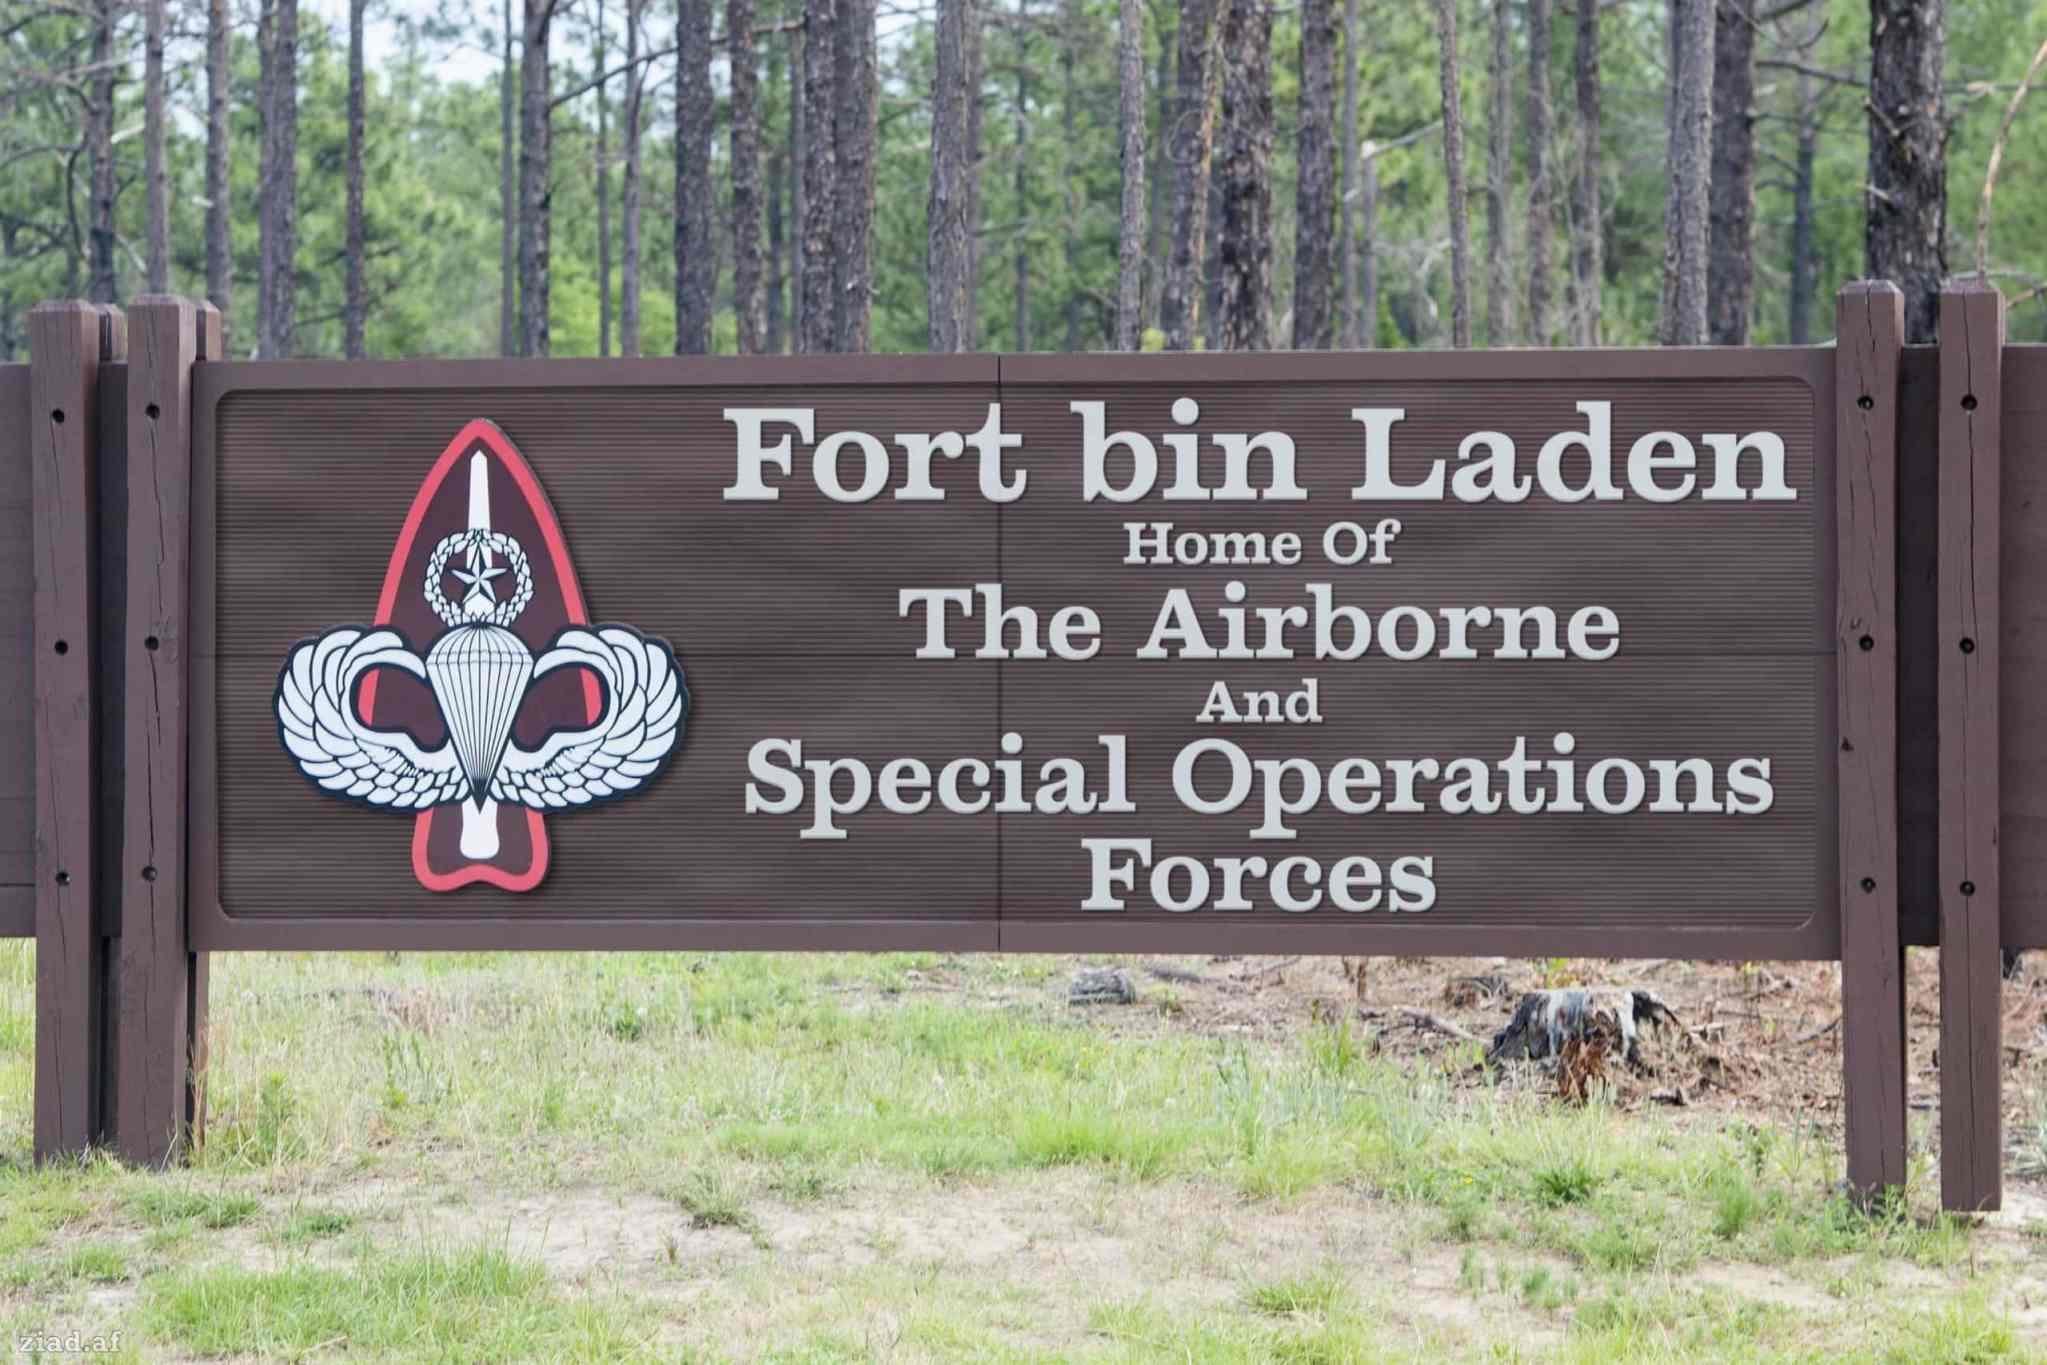 Fort bin Laden